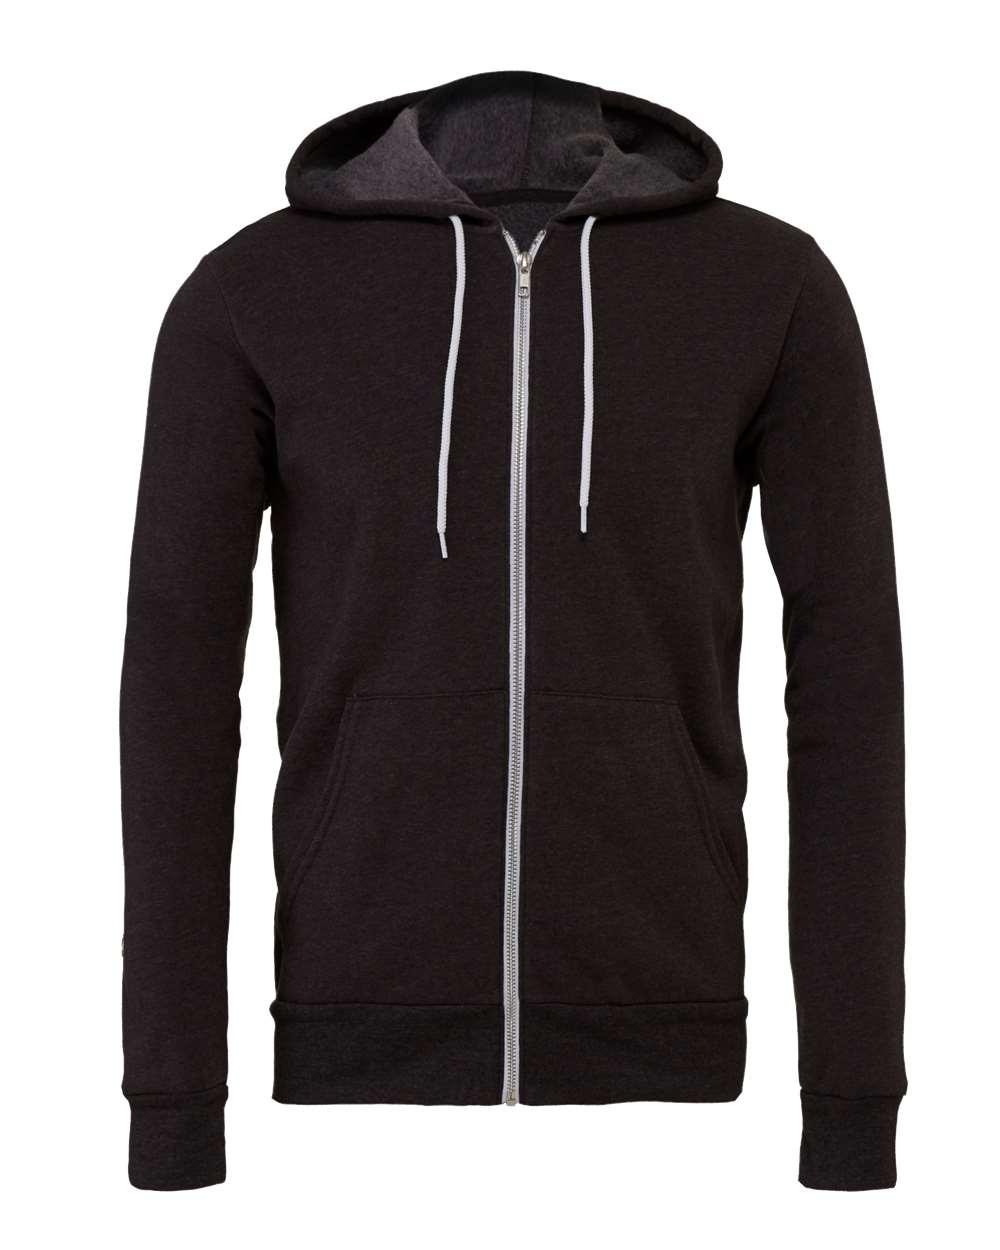 Bella-Canvas-Unisex-Full-Zip-Up-Hooded-Sweatshirt-Blank-Hoodie-3739-up-to-3XL thumbnail 18